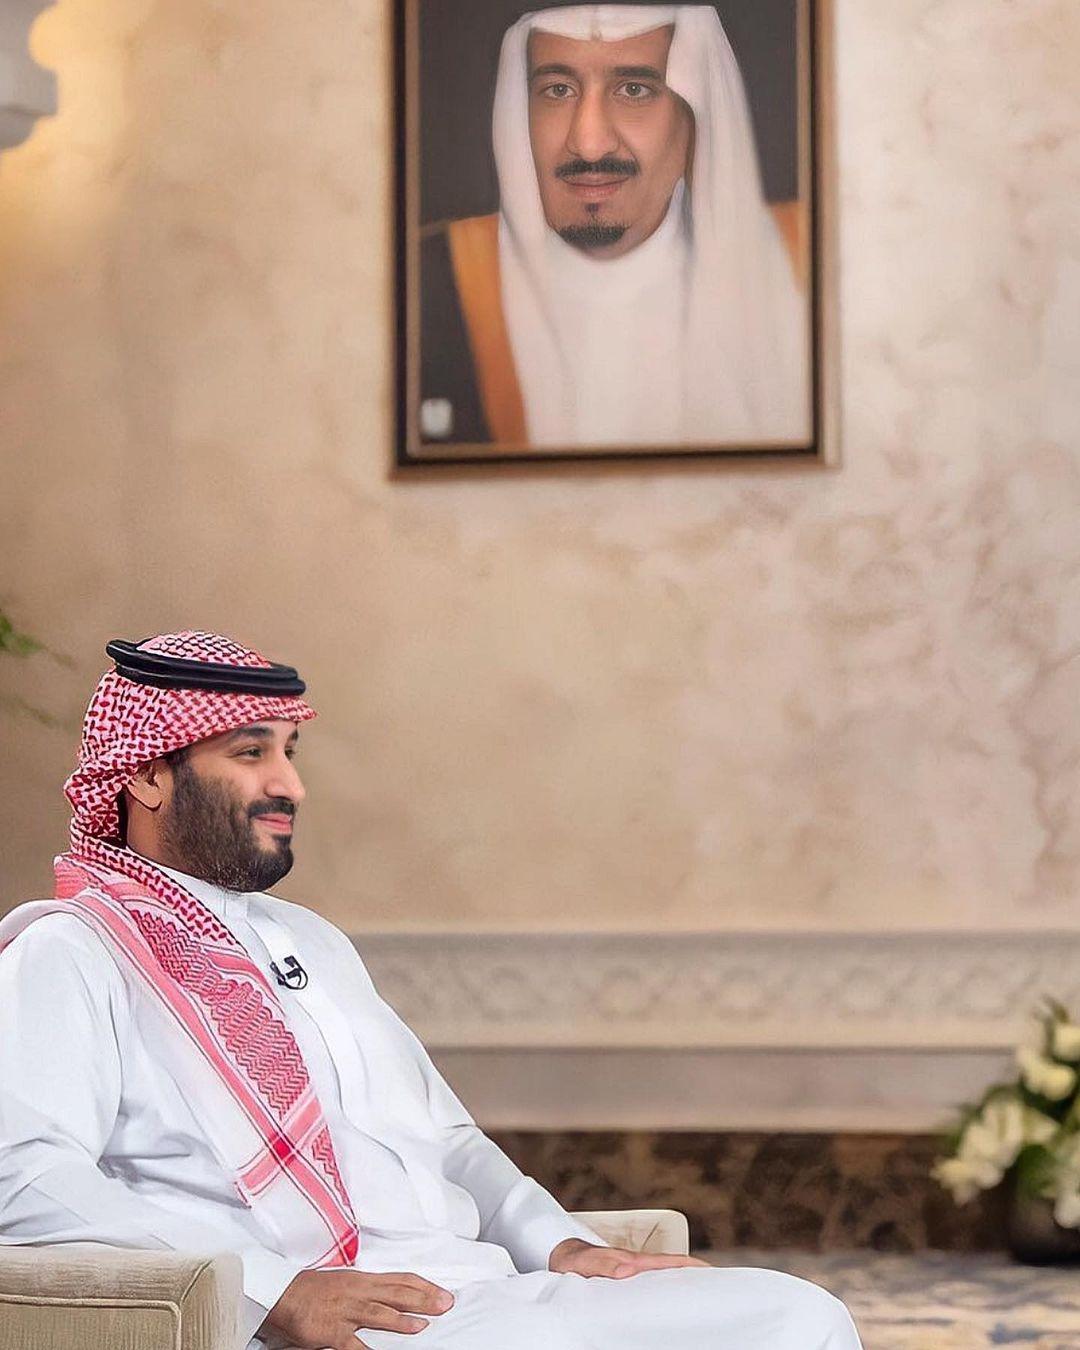 6 Facts About Saudi Crown Prince, Mohammed Bin Salman